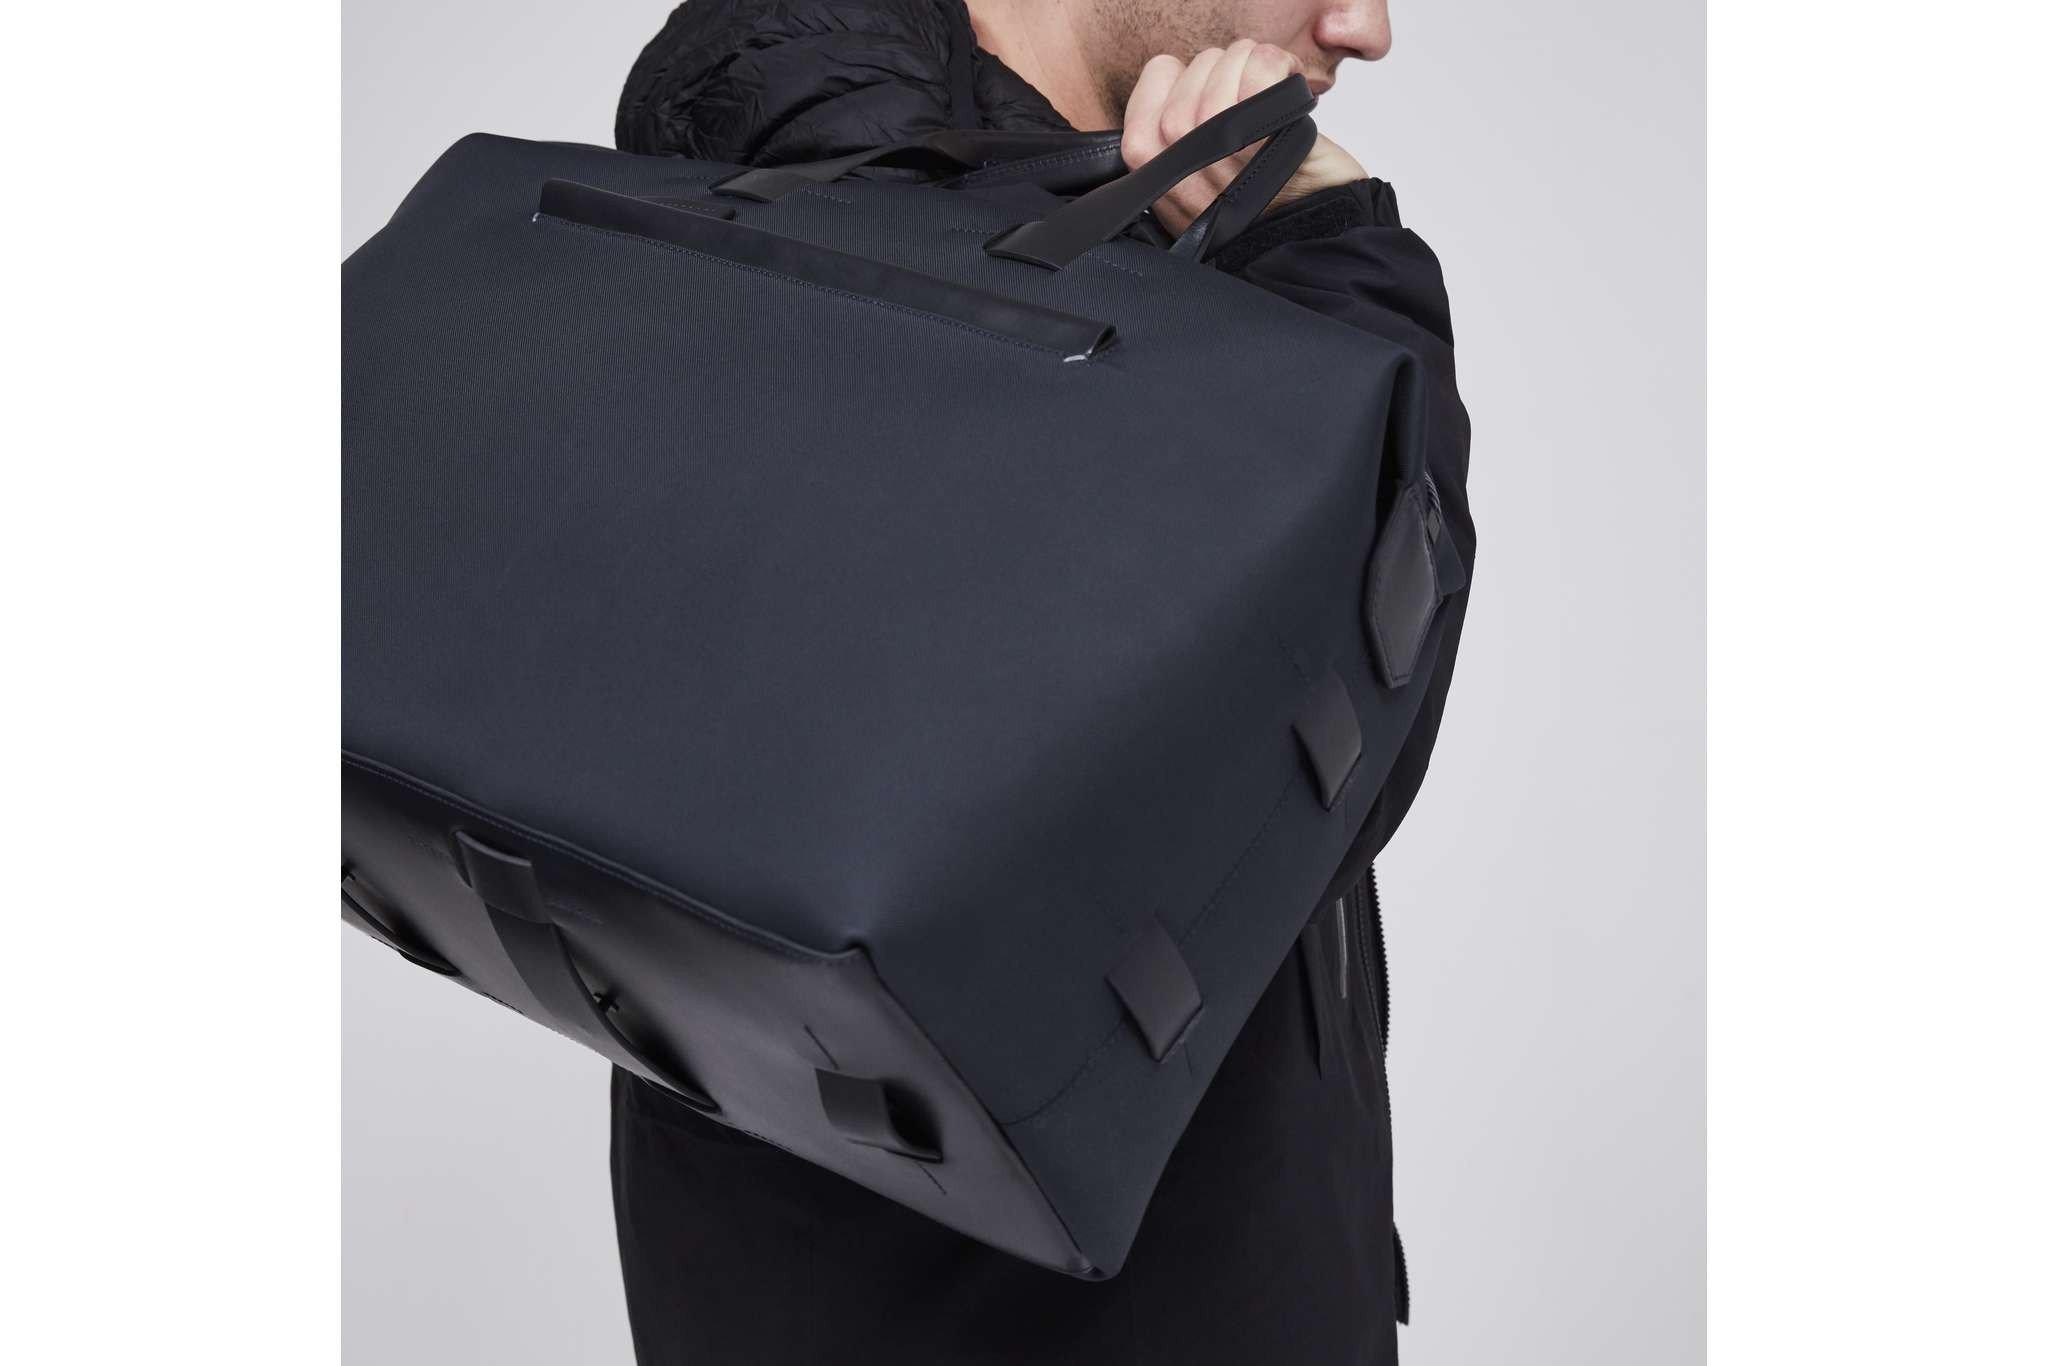 mens_fabric_leather_weekend_bag_MW4324.jpg